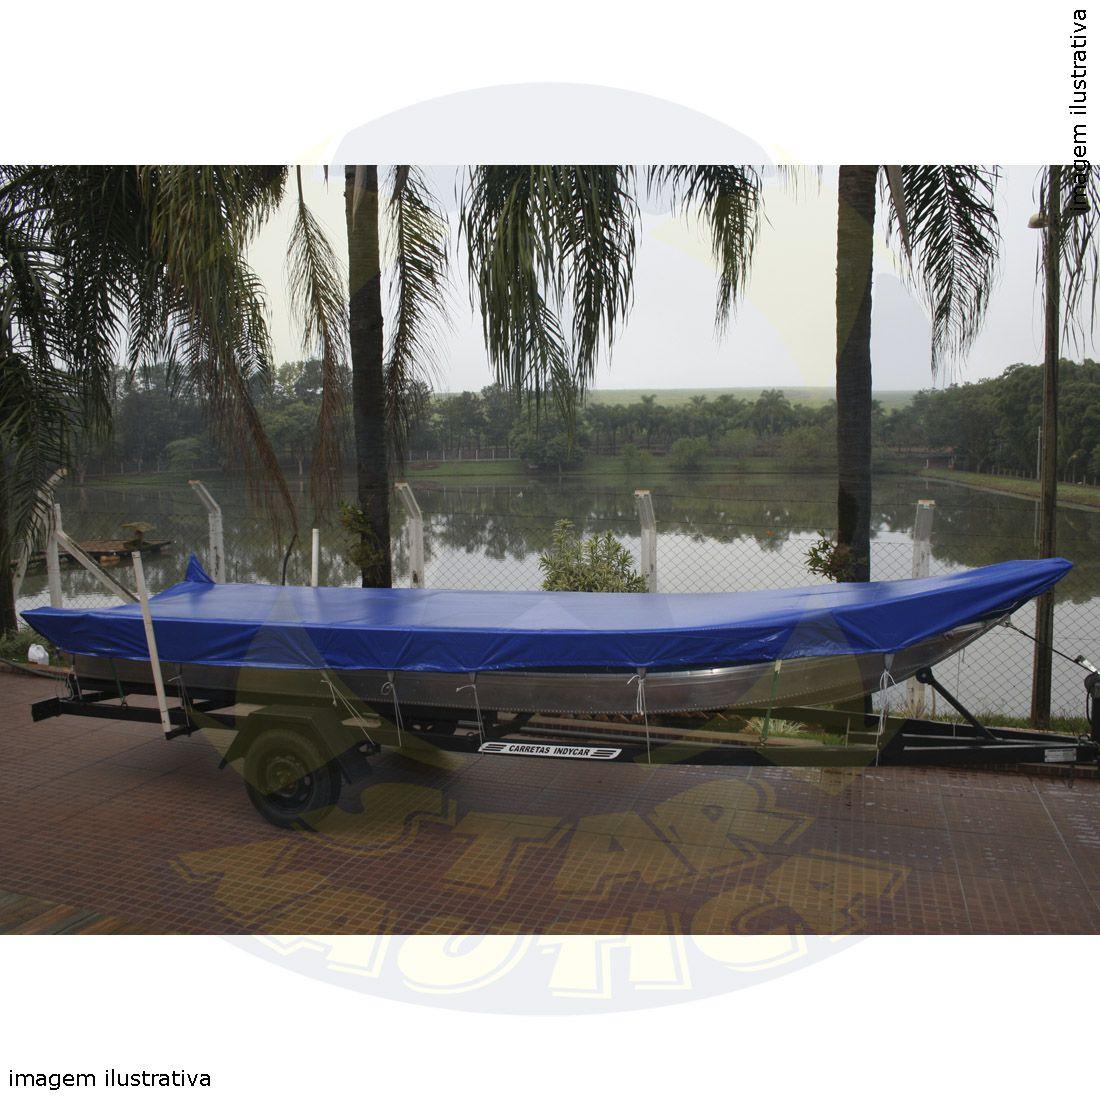 Capa Lona de Cobertura Barco Marujo 600 Lona Vinílica